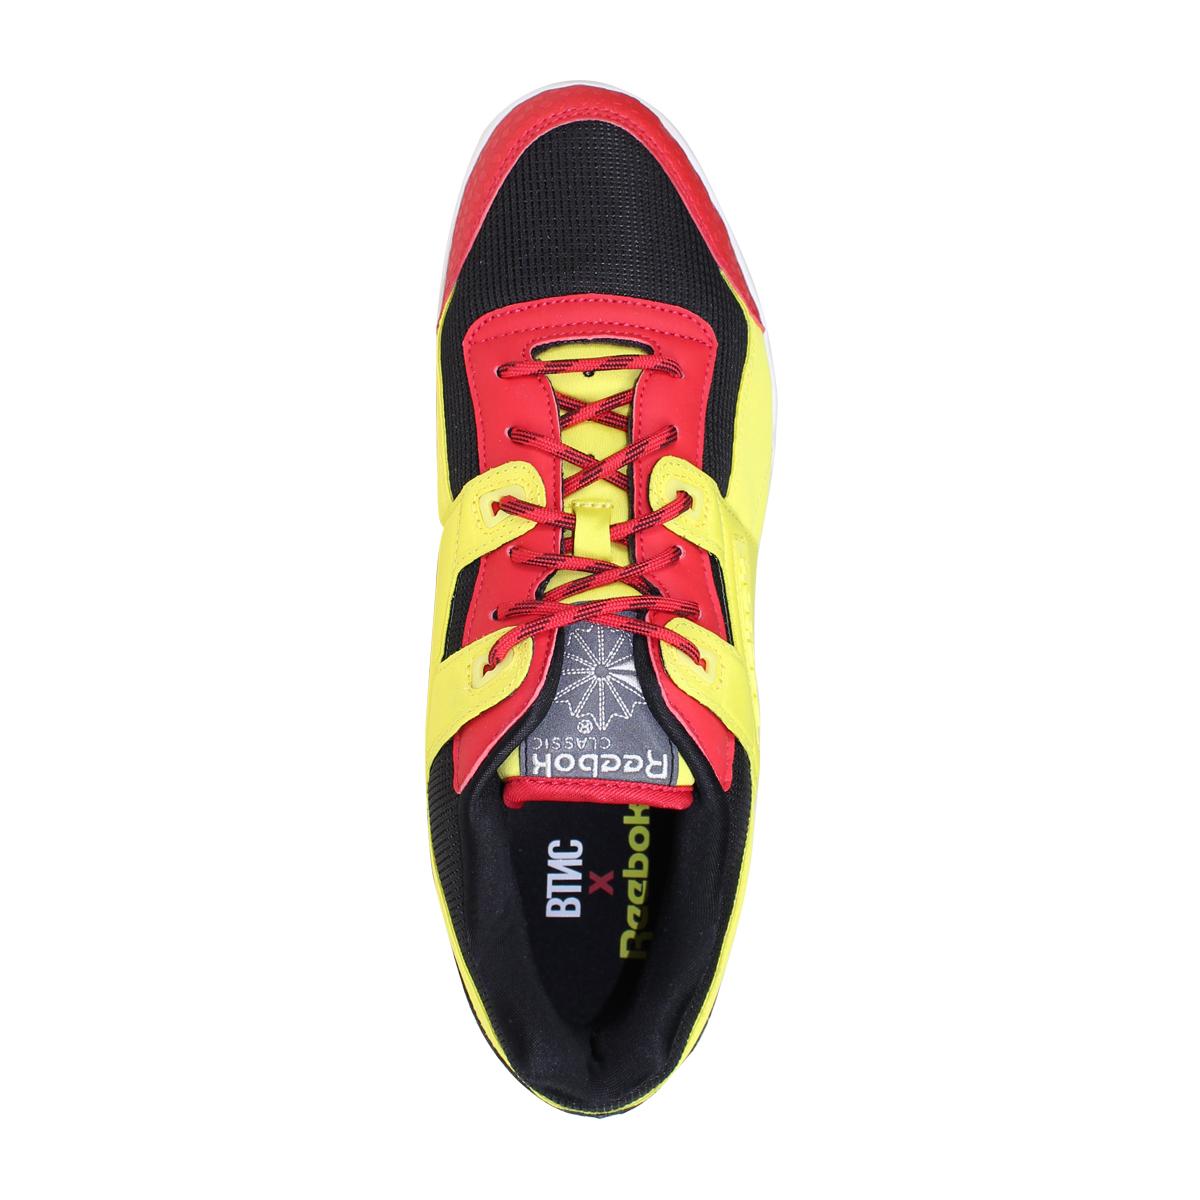 da8cdc1ebc0 Reebok WORKOUT PLUS BEATNIC CITRON Reebok practice game men sneakers J90972  red  6 16 Shinnyu load   186